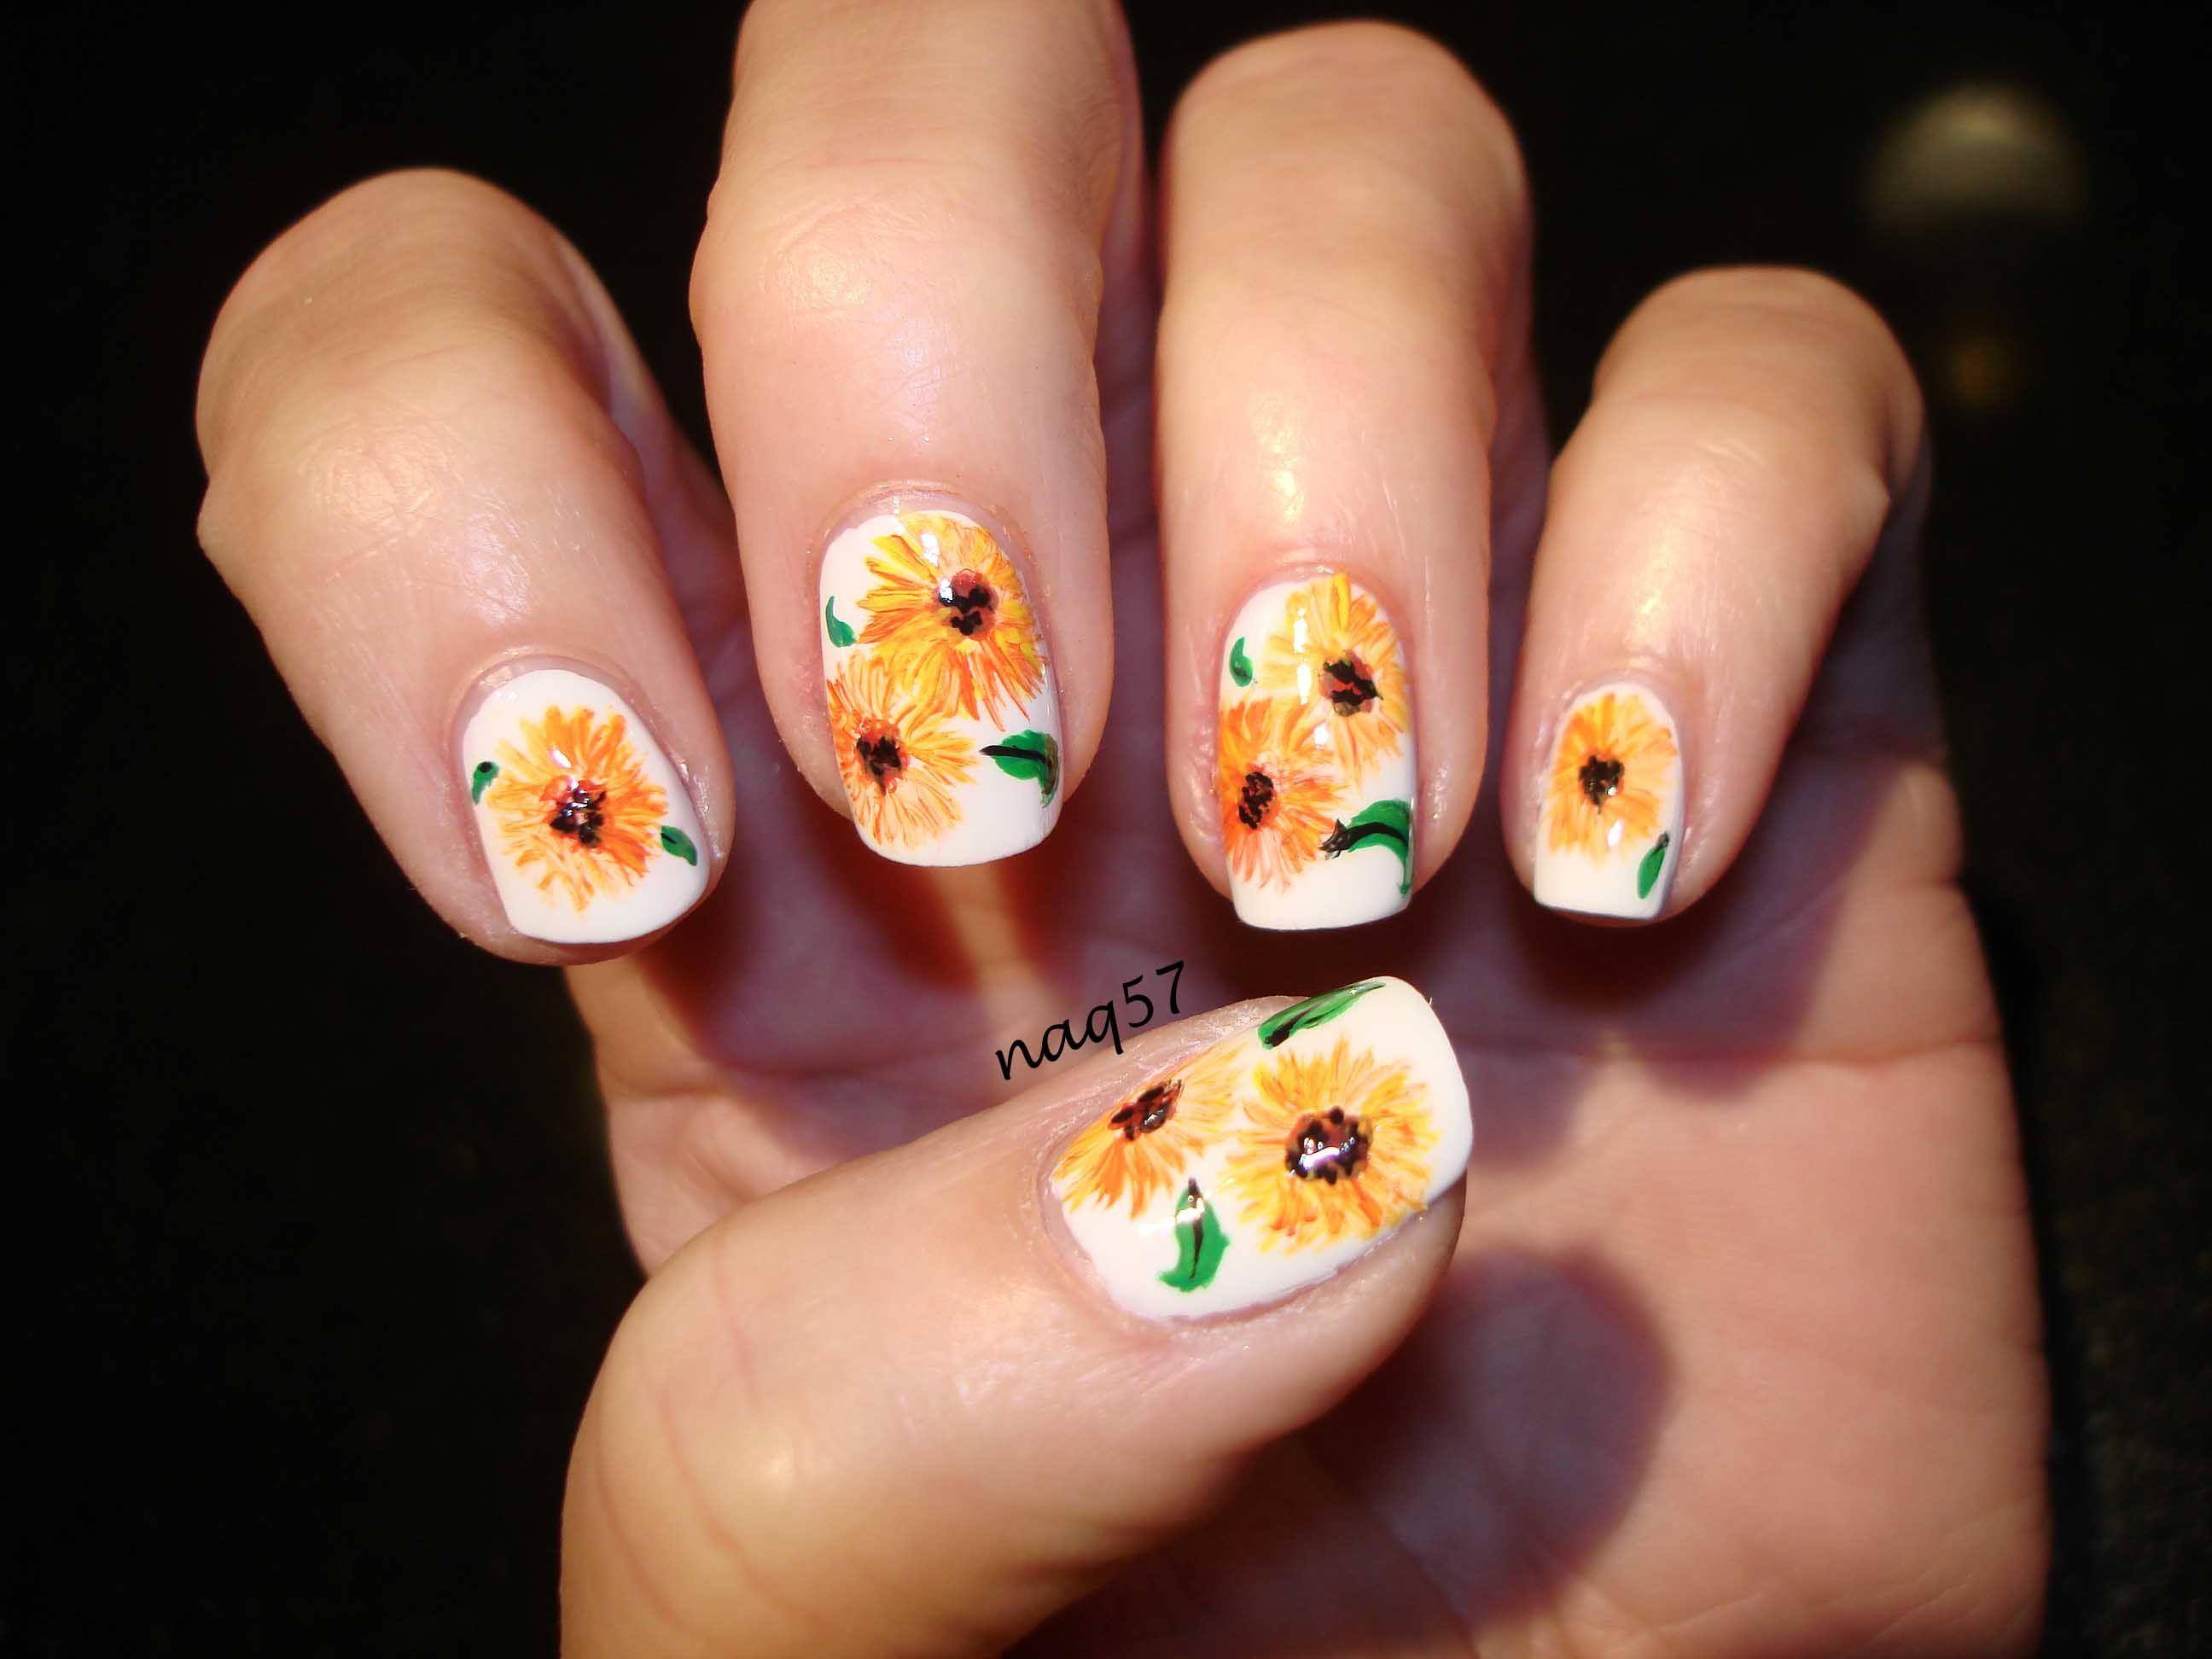 Pin Abby Casmay Nail Design Nails Sunflower And Arts